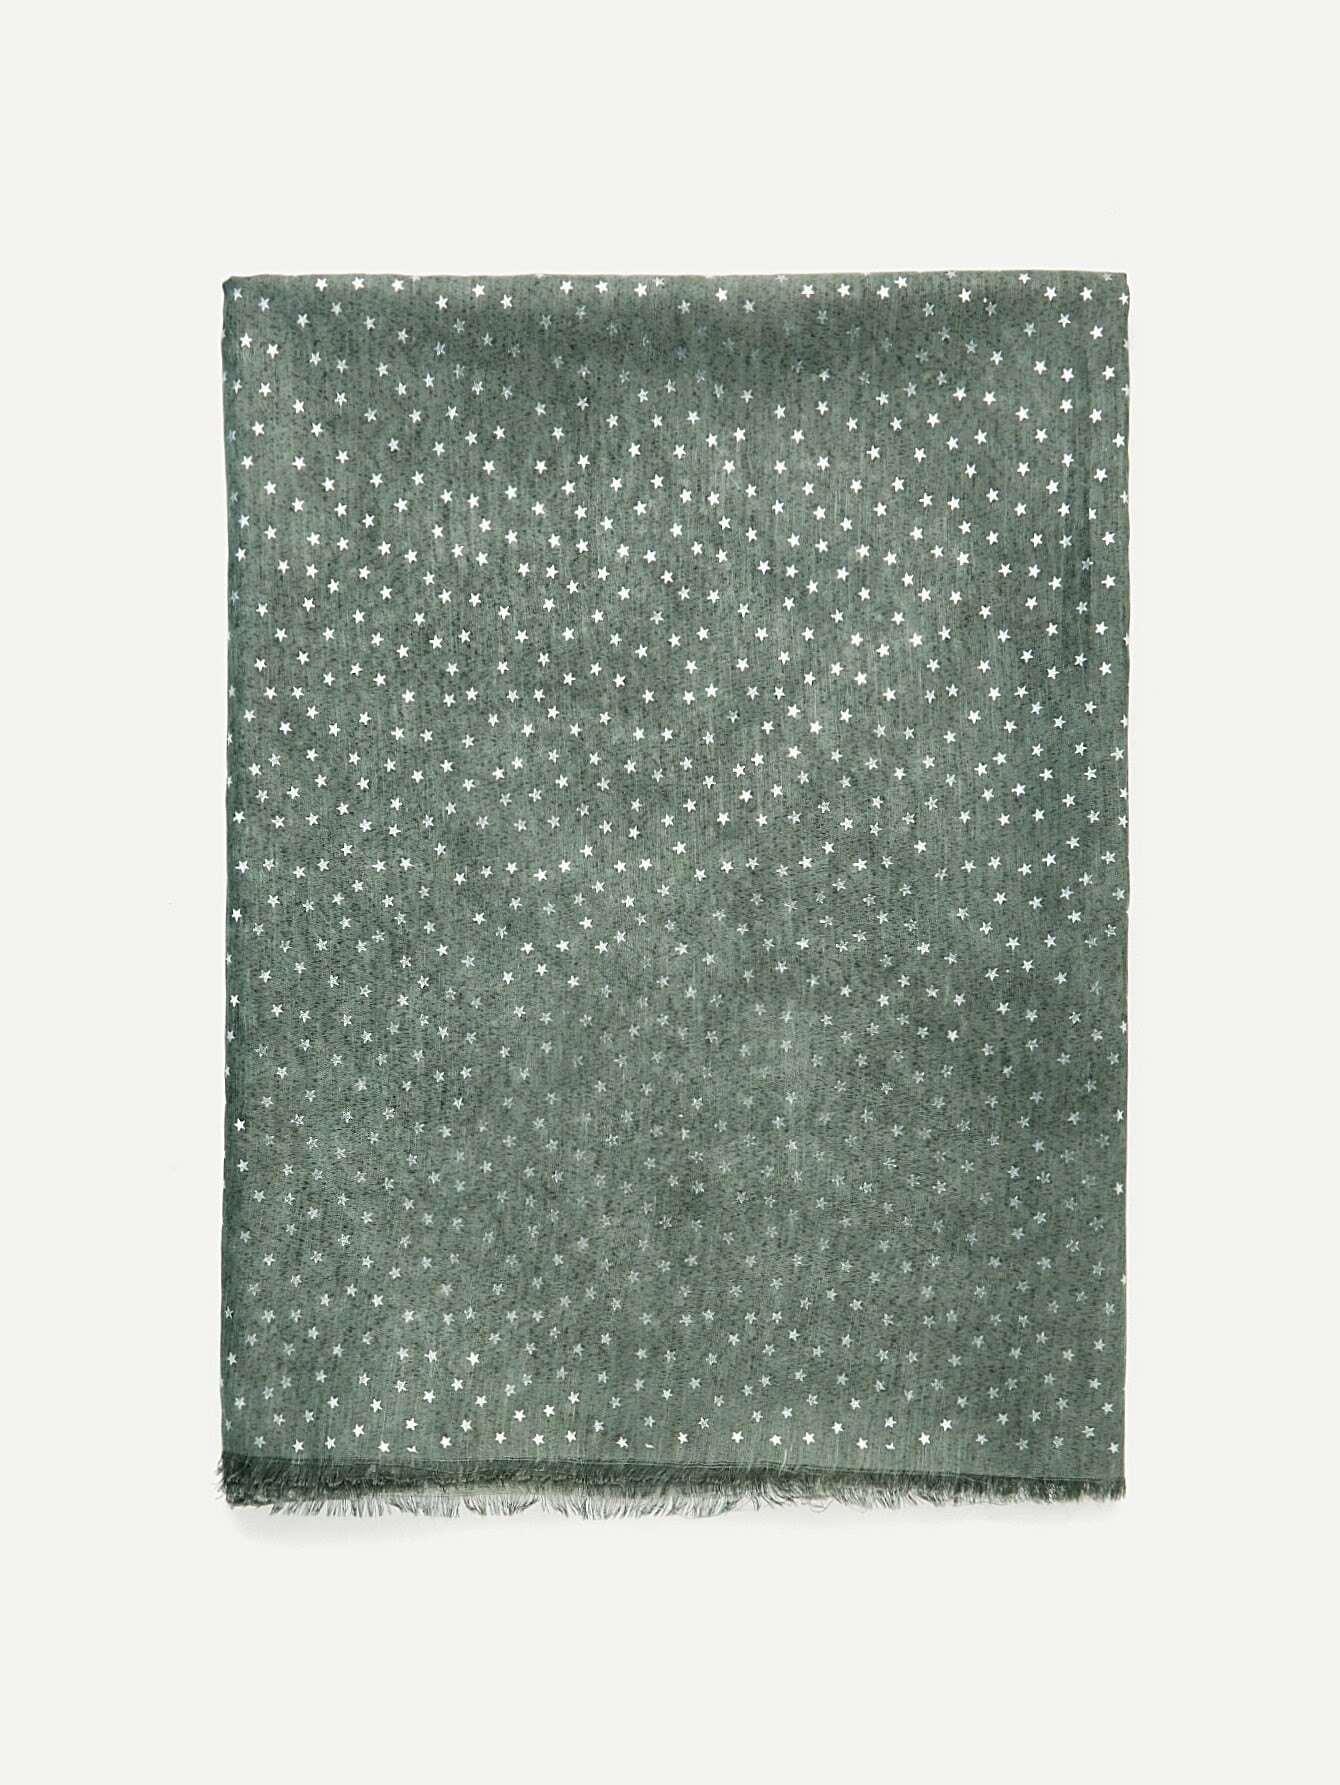 Metallic Star Print Raw Edge Scarf джинсы мужские g star raw 604046 gs g star arc